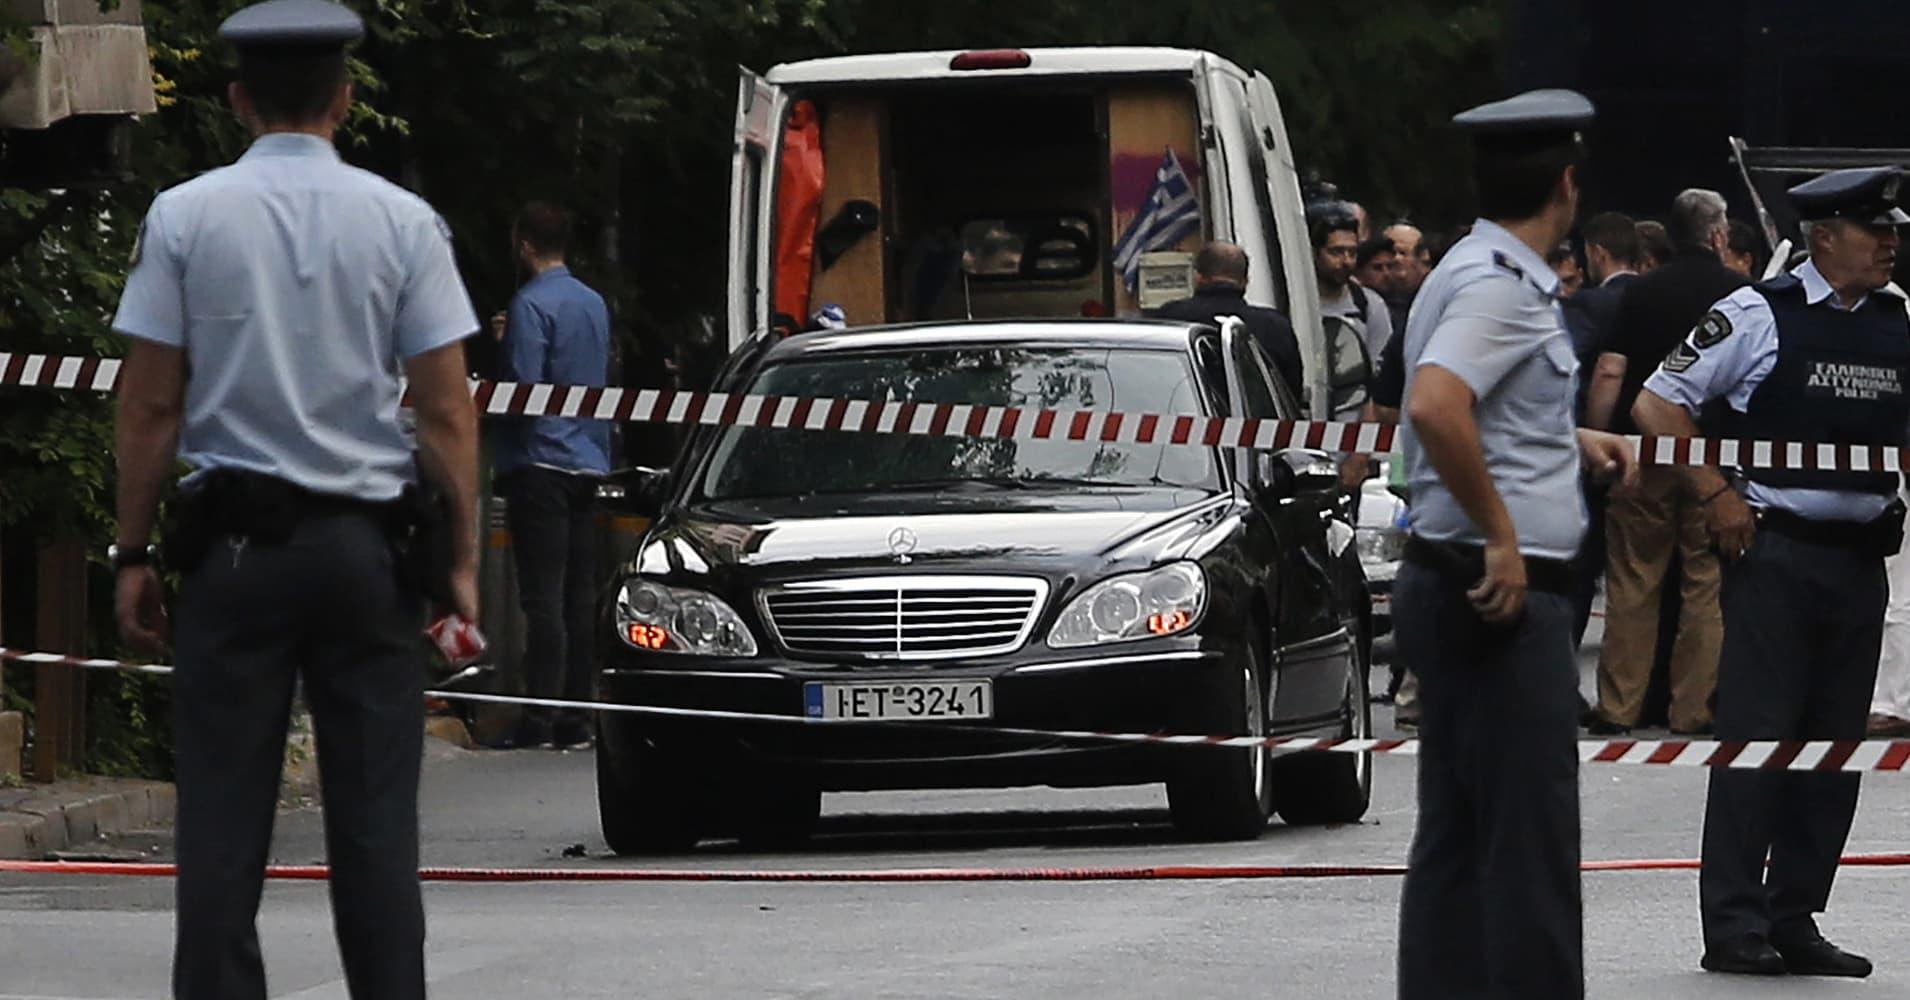 Car blast injures Greece's ex-Prime Minister Papademos